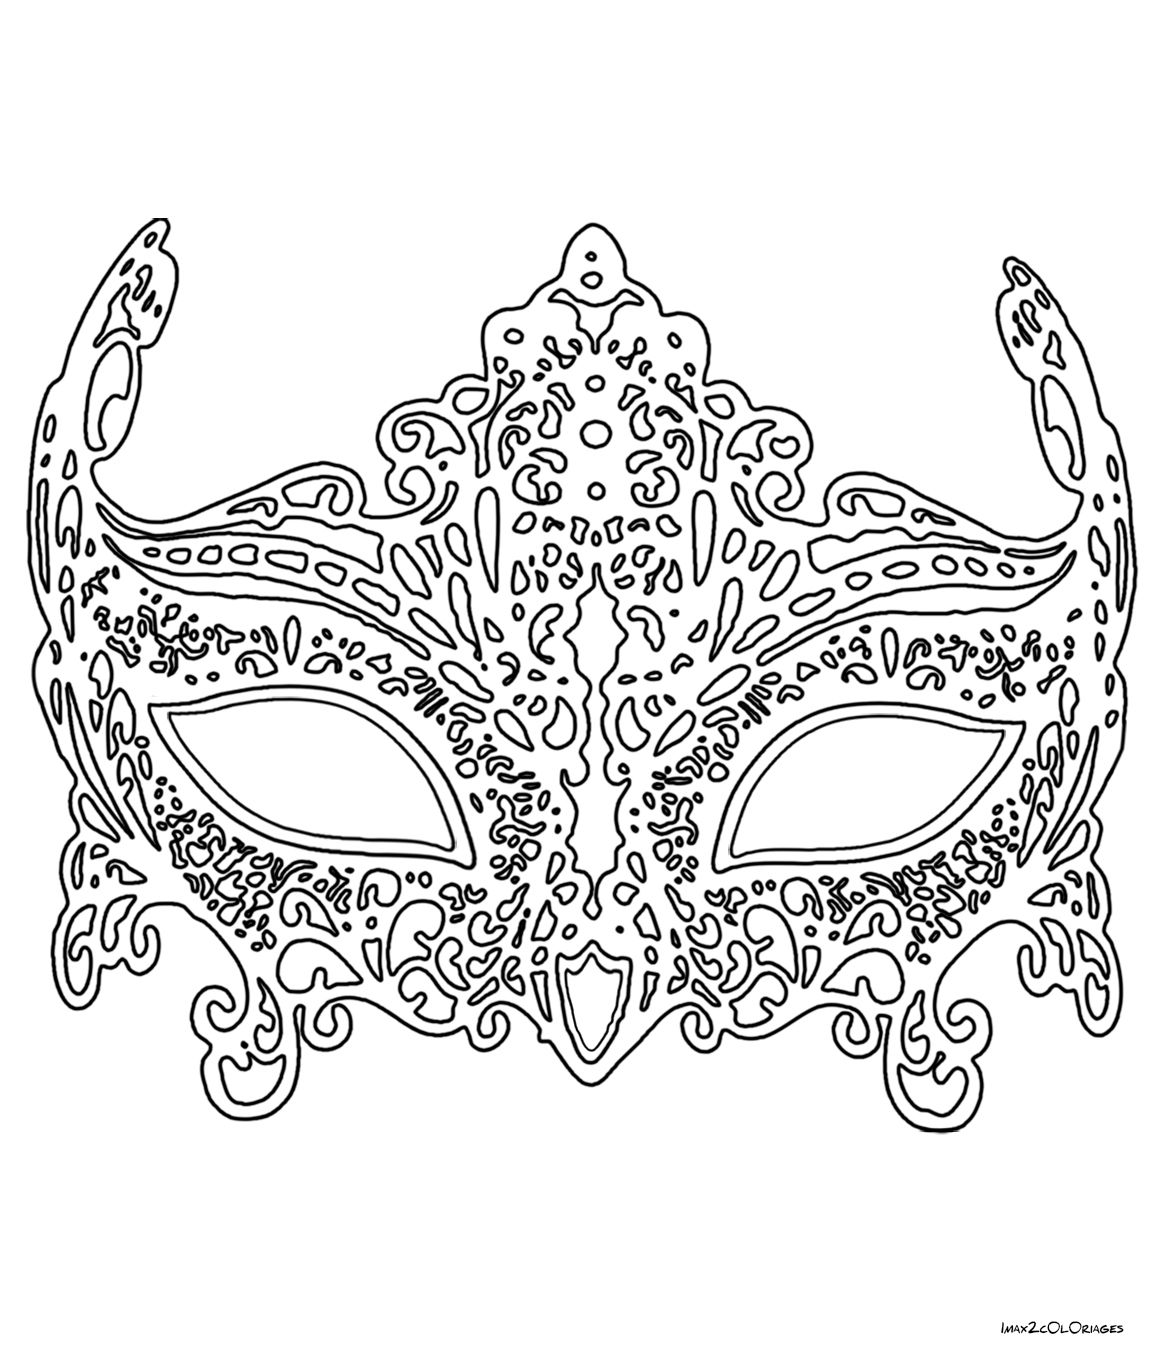 Coloriage masque de venise en dentelle coloring pages coloring sheets coloring books et - Coloriage masque a imprimer ...